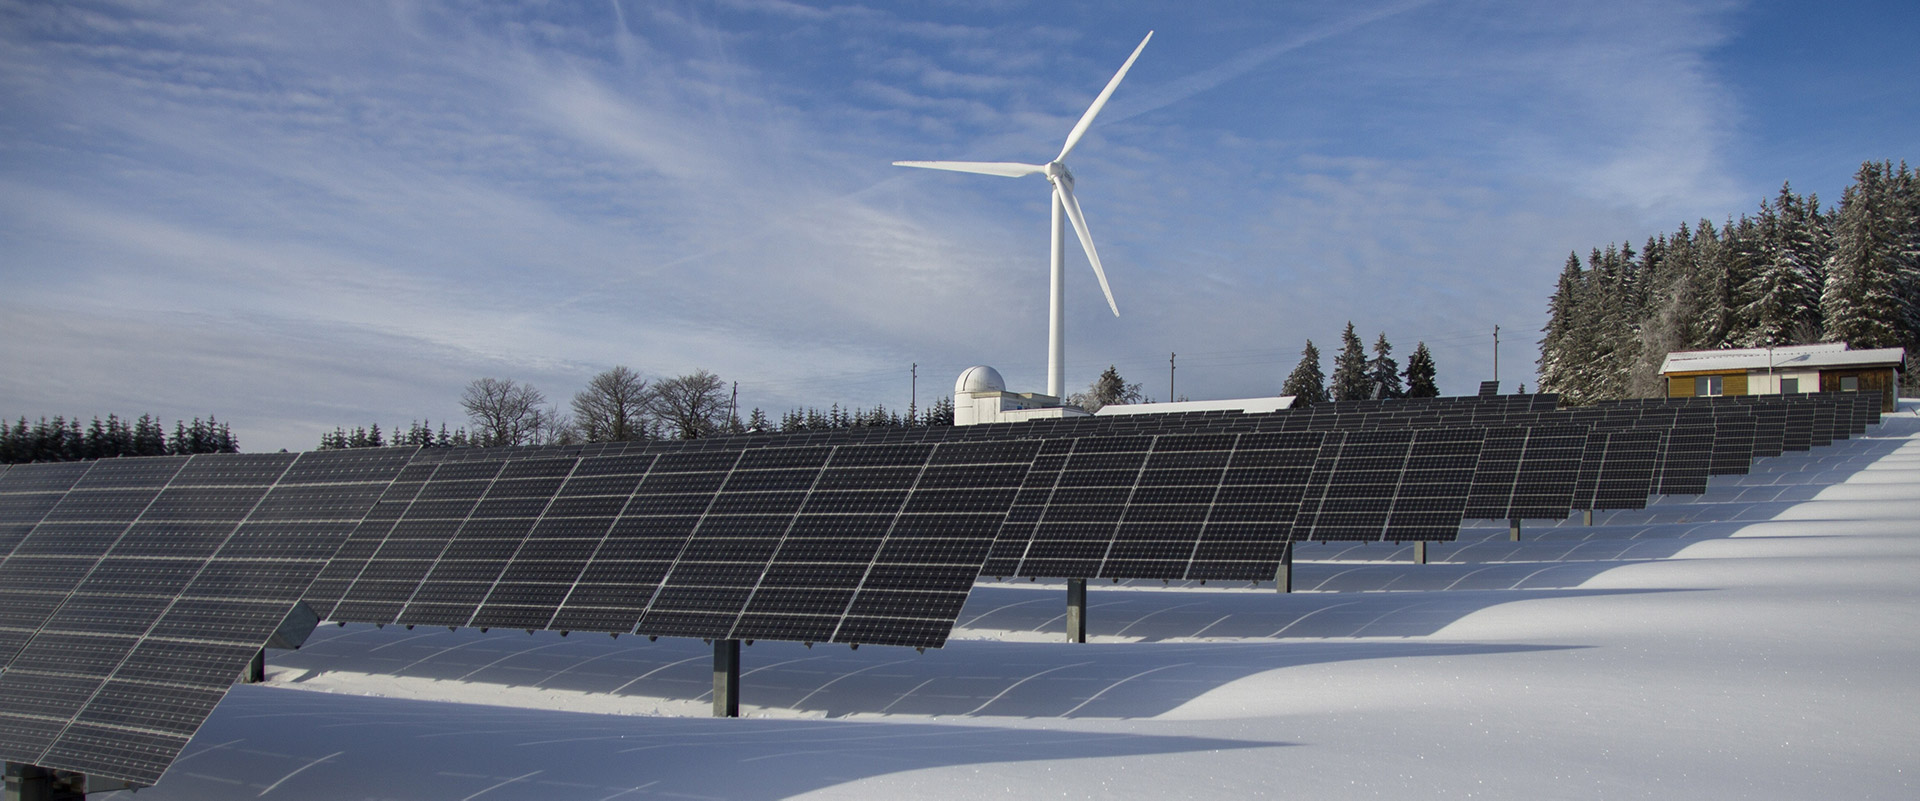 solar panels and wind turbine on a snowy field